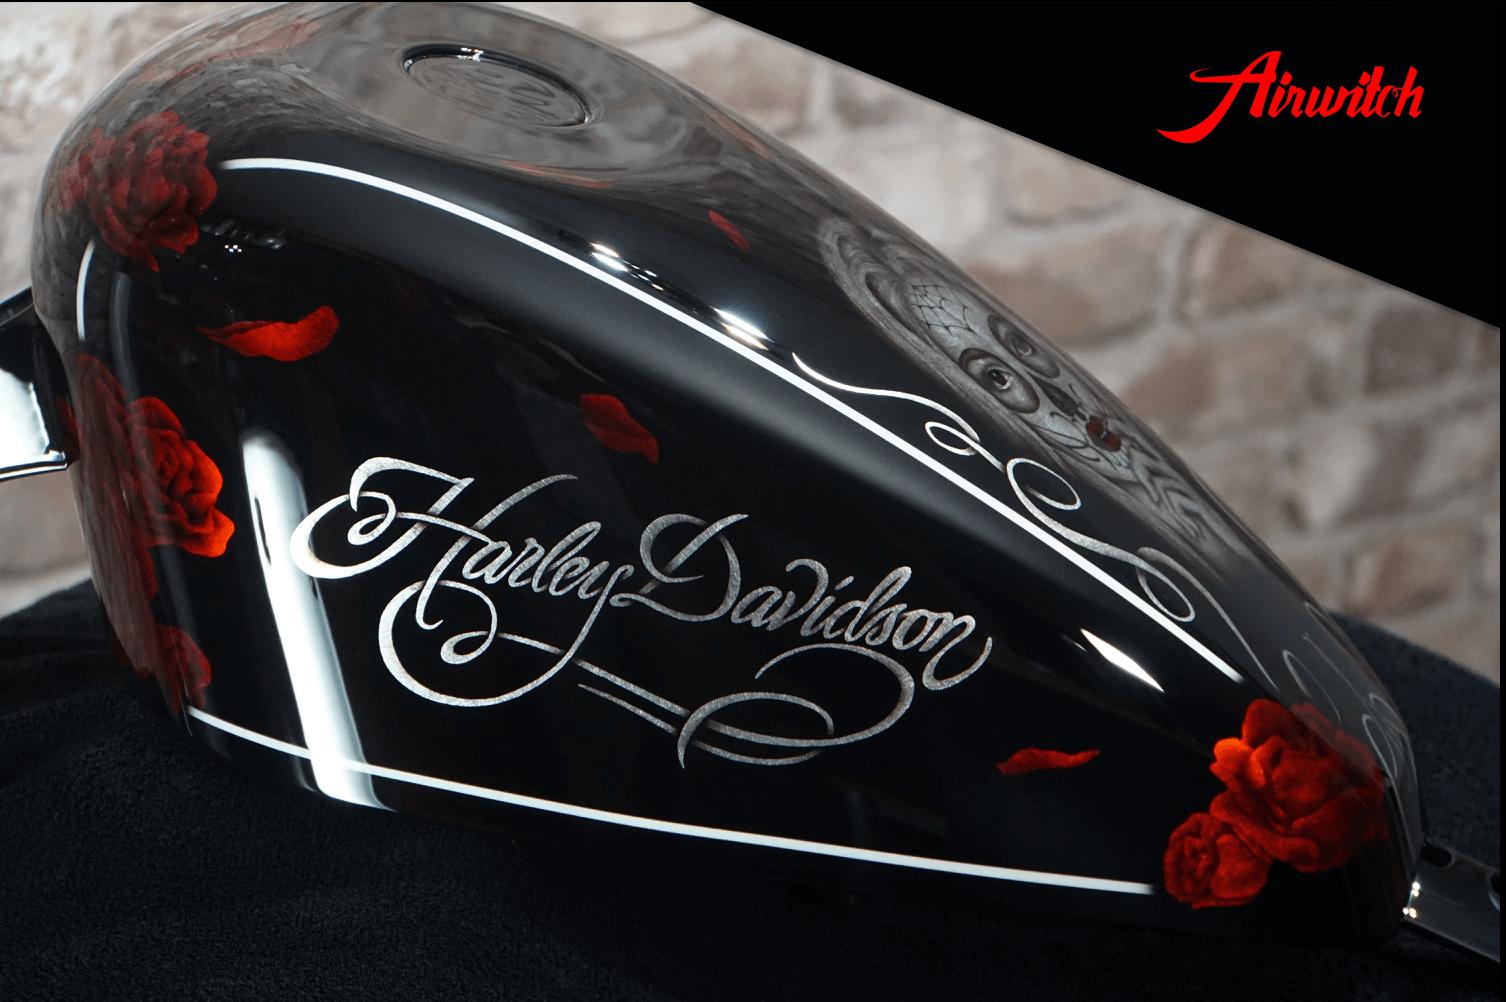 Custom Paint Harley-Davidson Sportster Red Roses La Catrina Airbrush Tank Lackierung Silverleaf